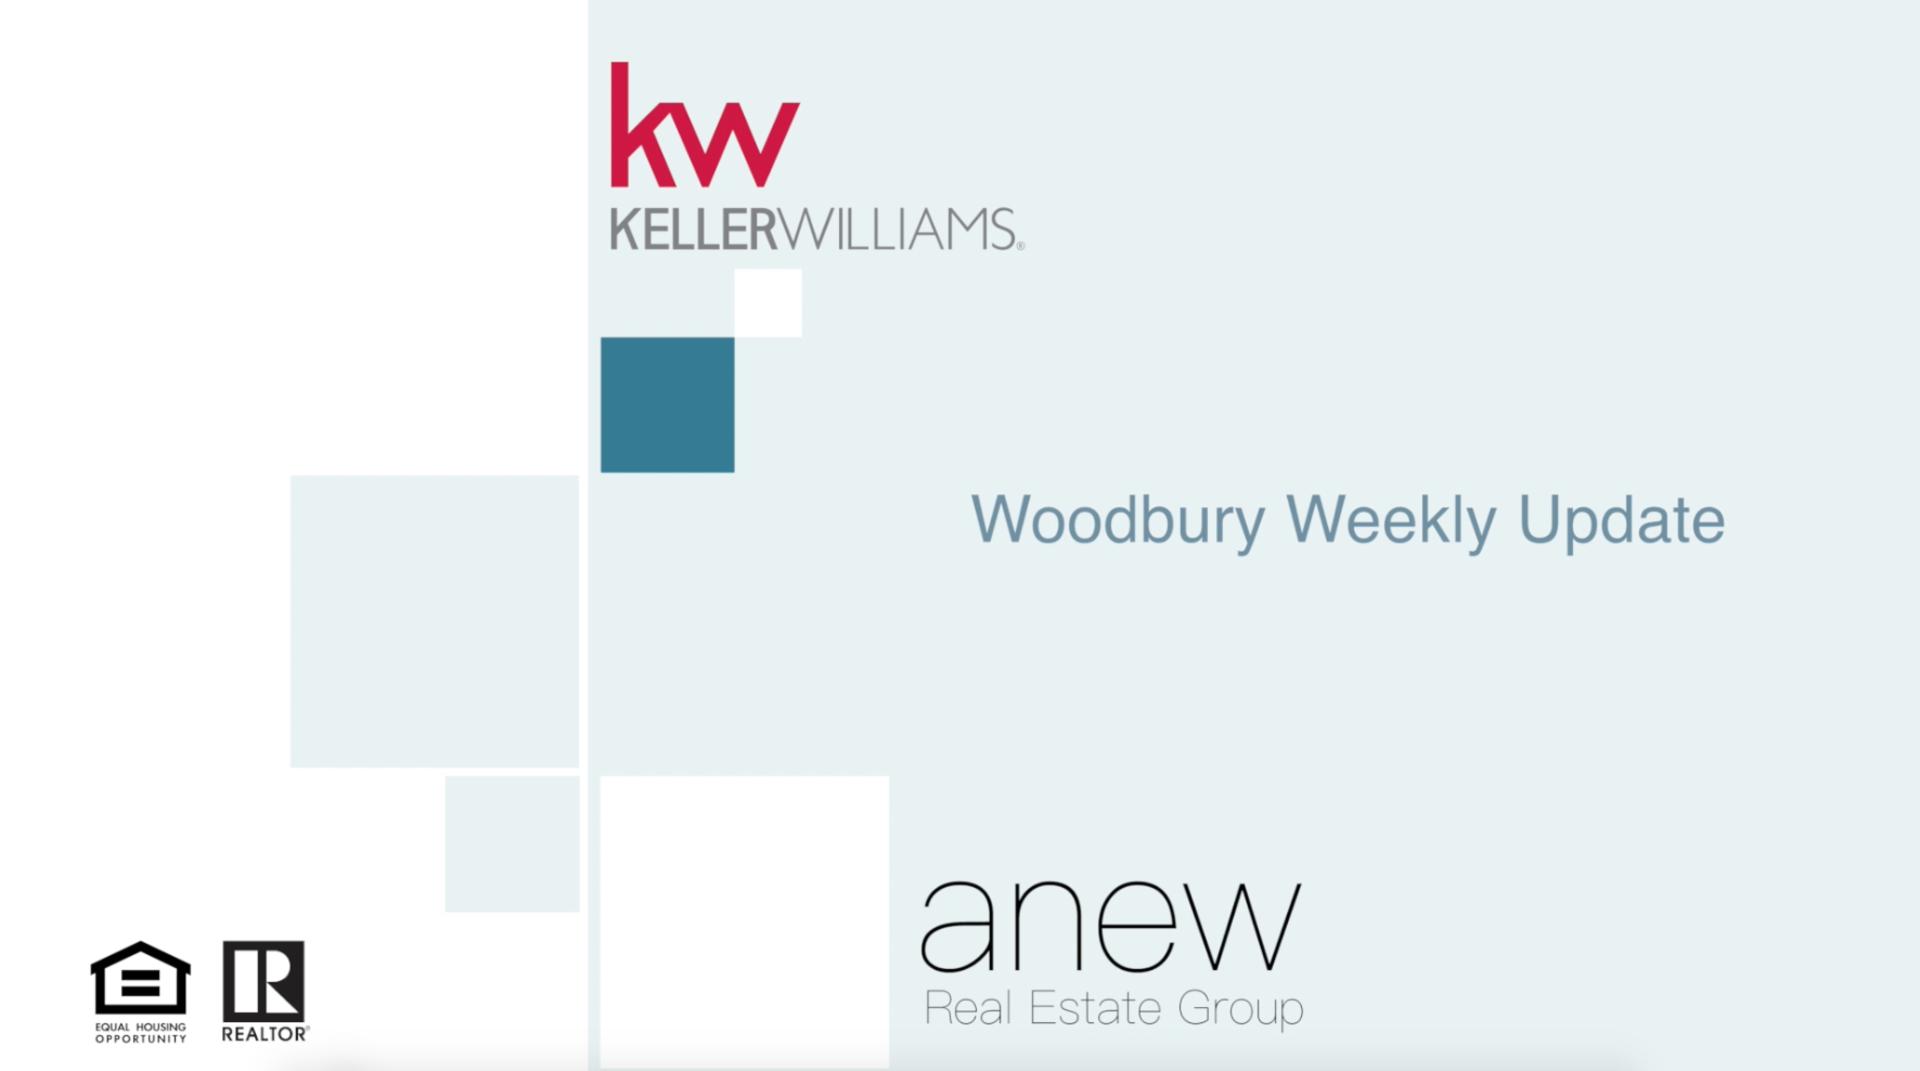 Woodbury Weekly Update for June 11th, 2018.